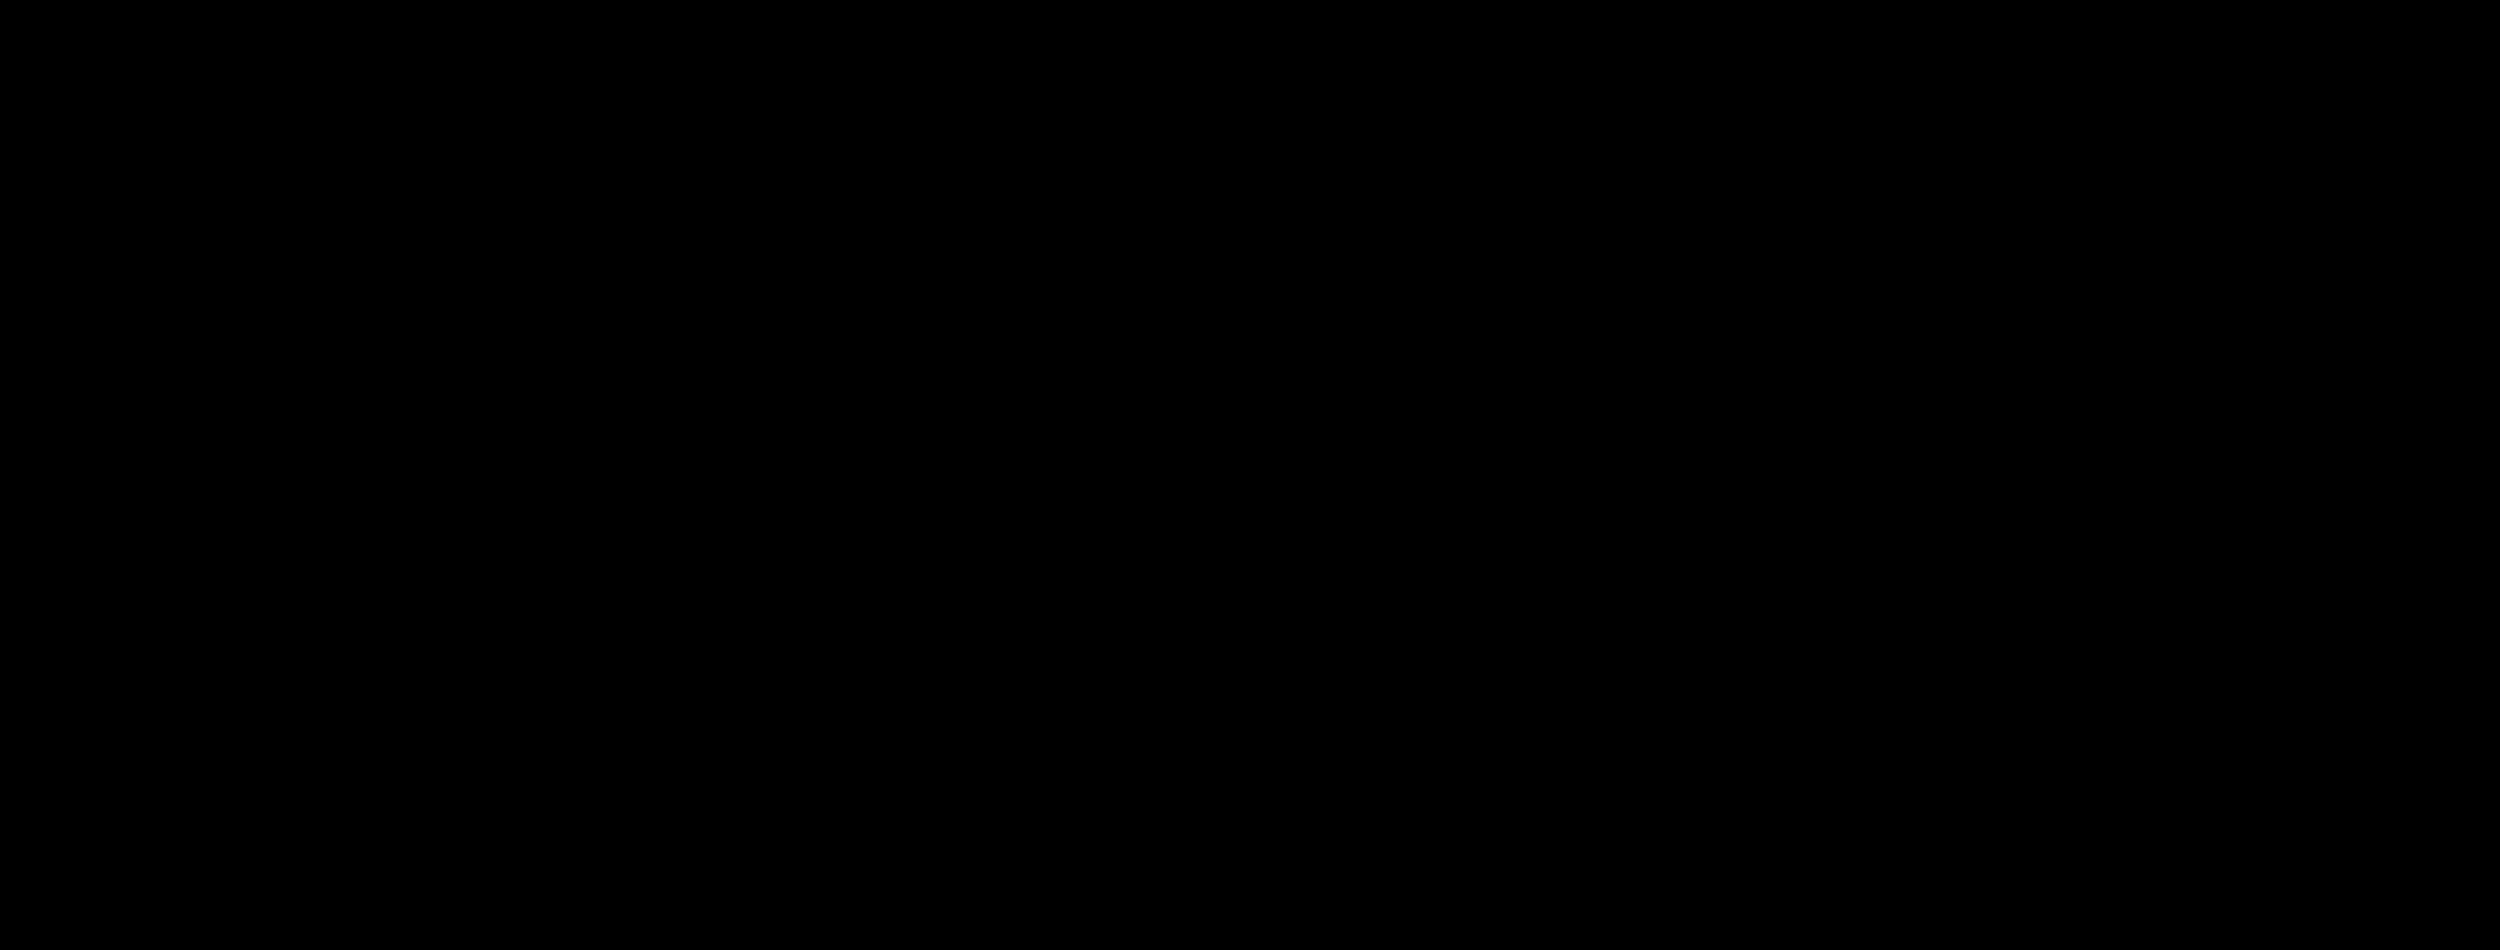 Pedrô!'s distinctive signature